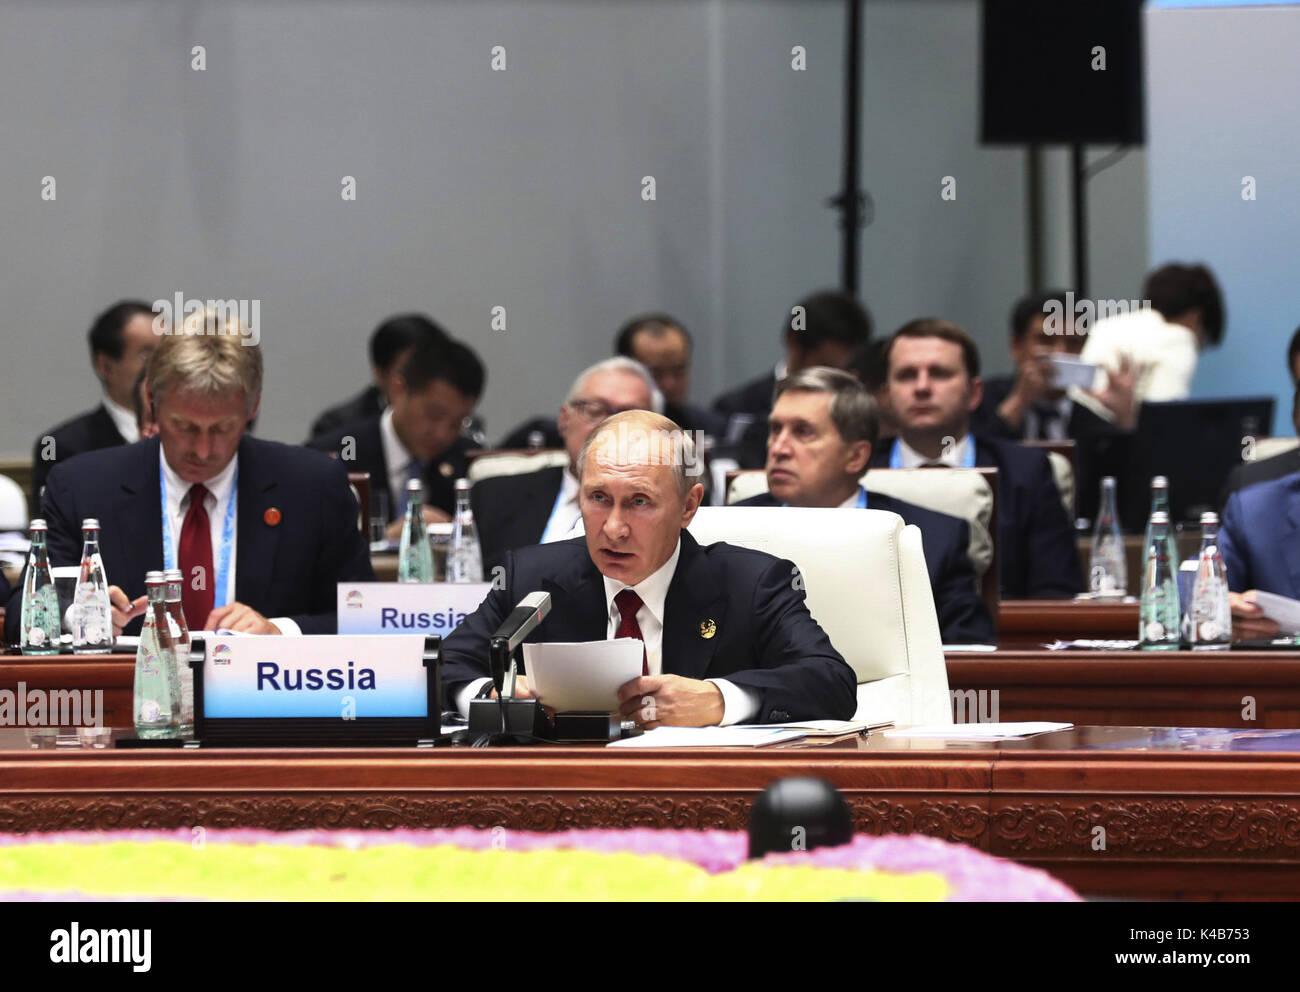 Xiamen, China's Fujian Province. 5th Sep, 2017. Russian President Vladimir Putin speaks at the Dialogue of Emerging Stock Photo